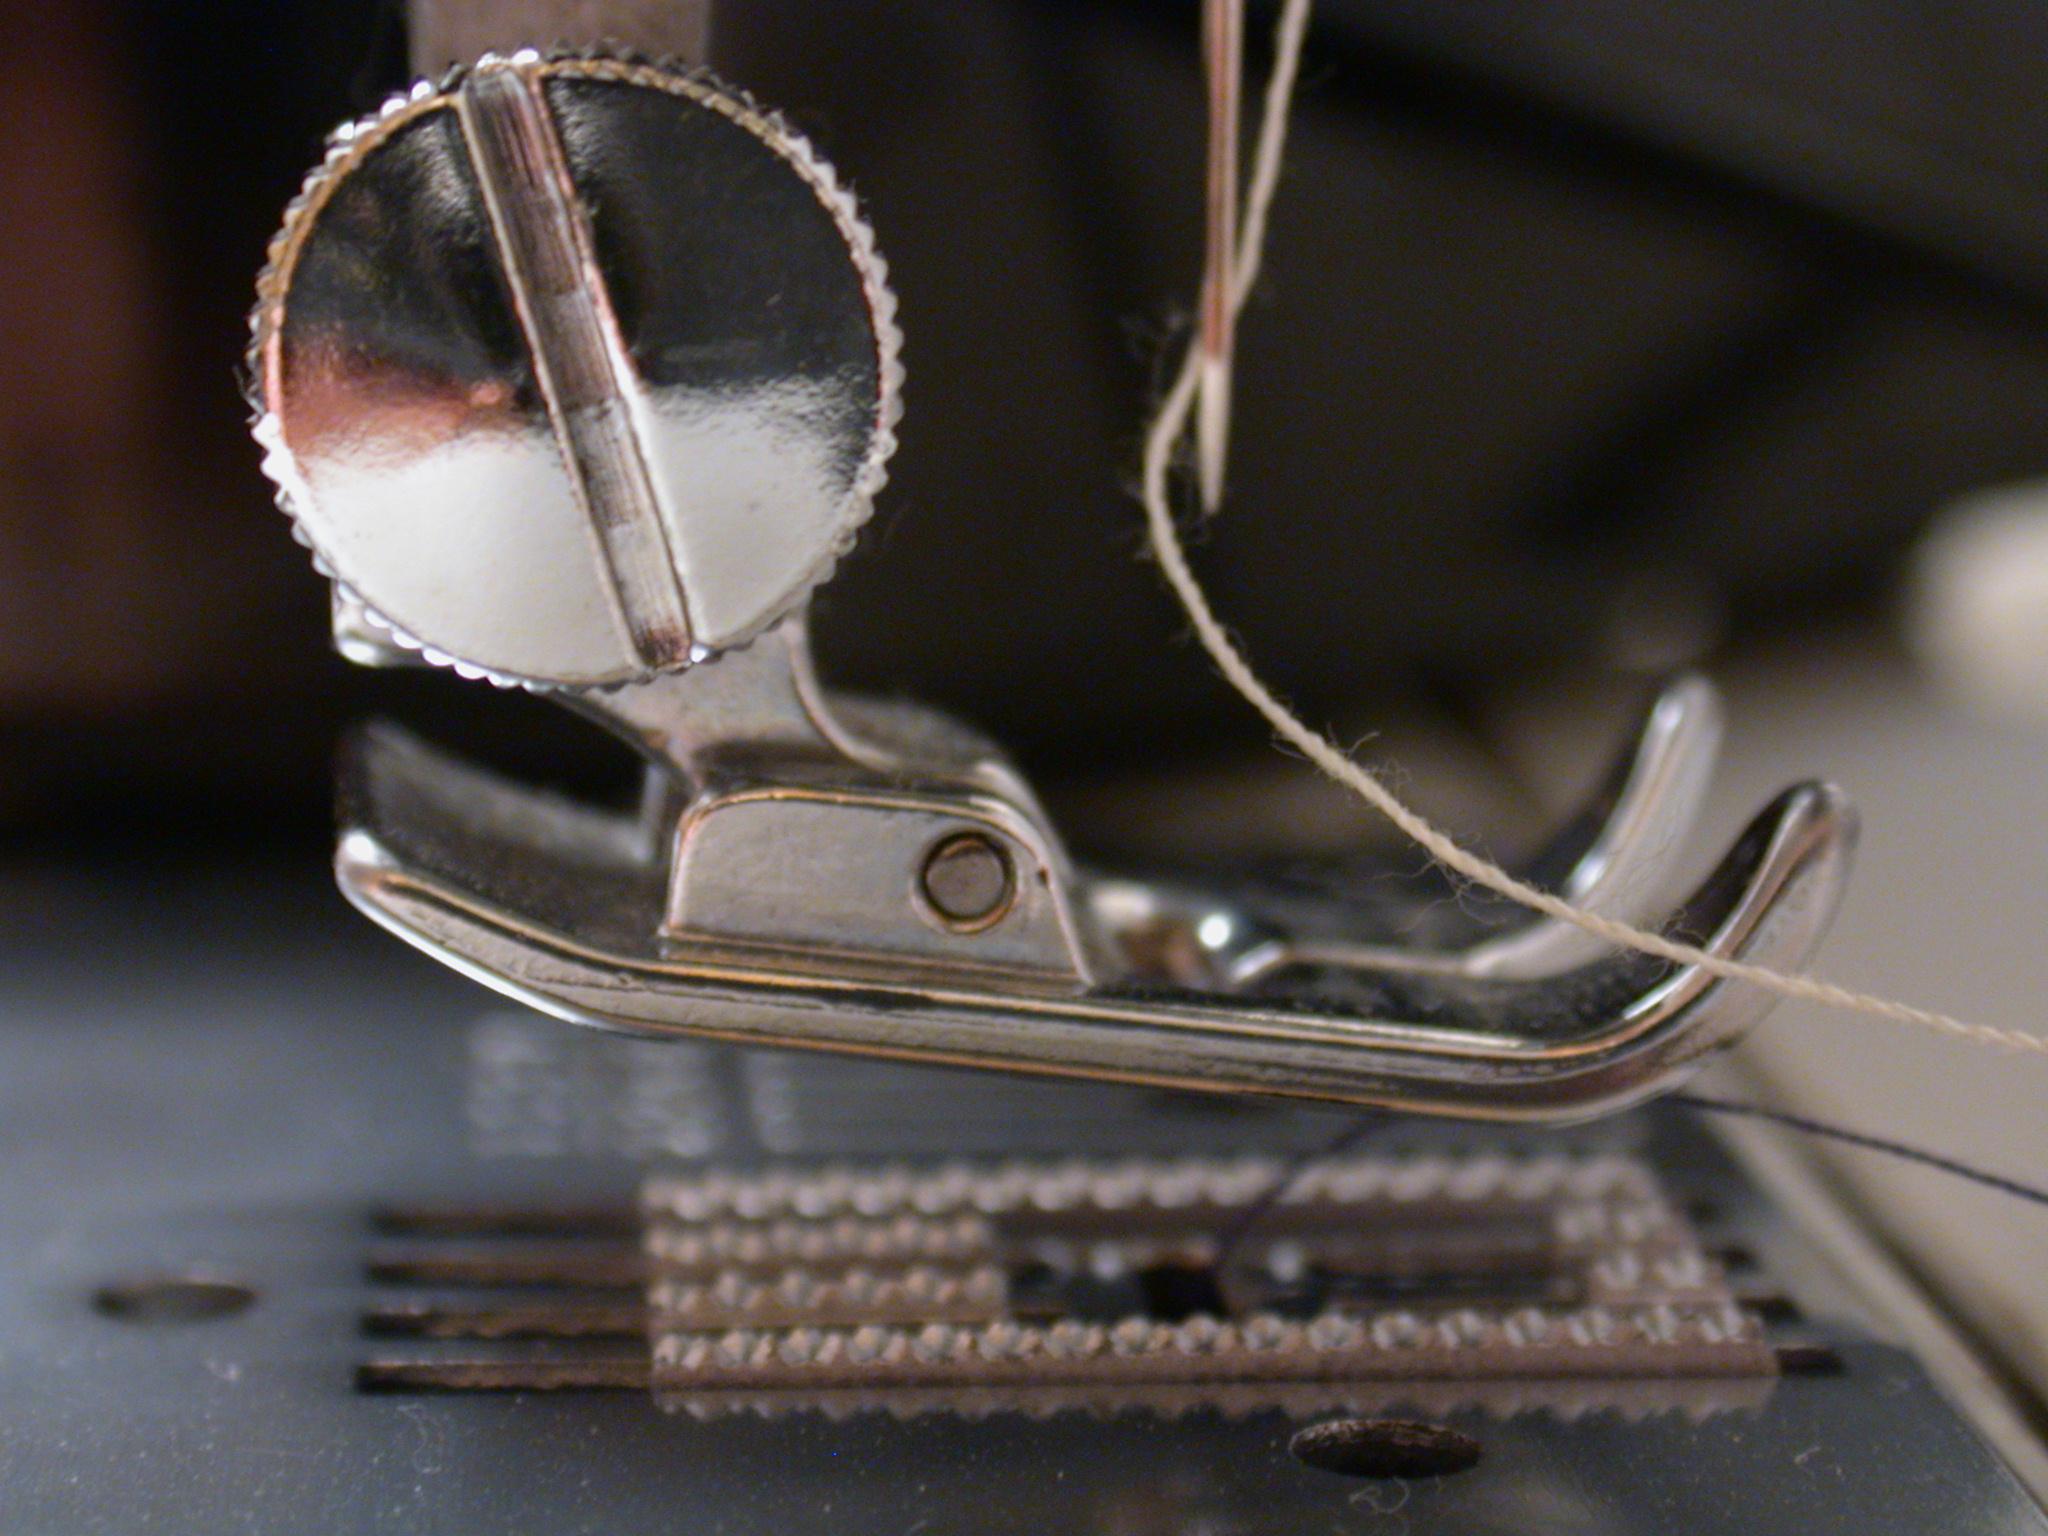 objects household sewing sew machine sewingmachine macro metal wheel thread chrome circle